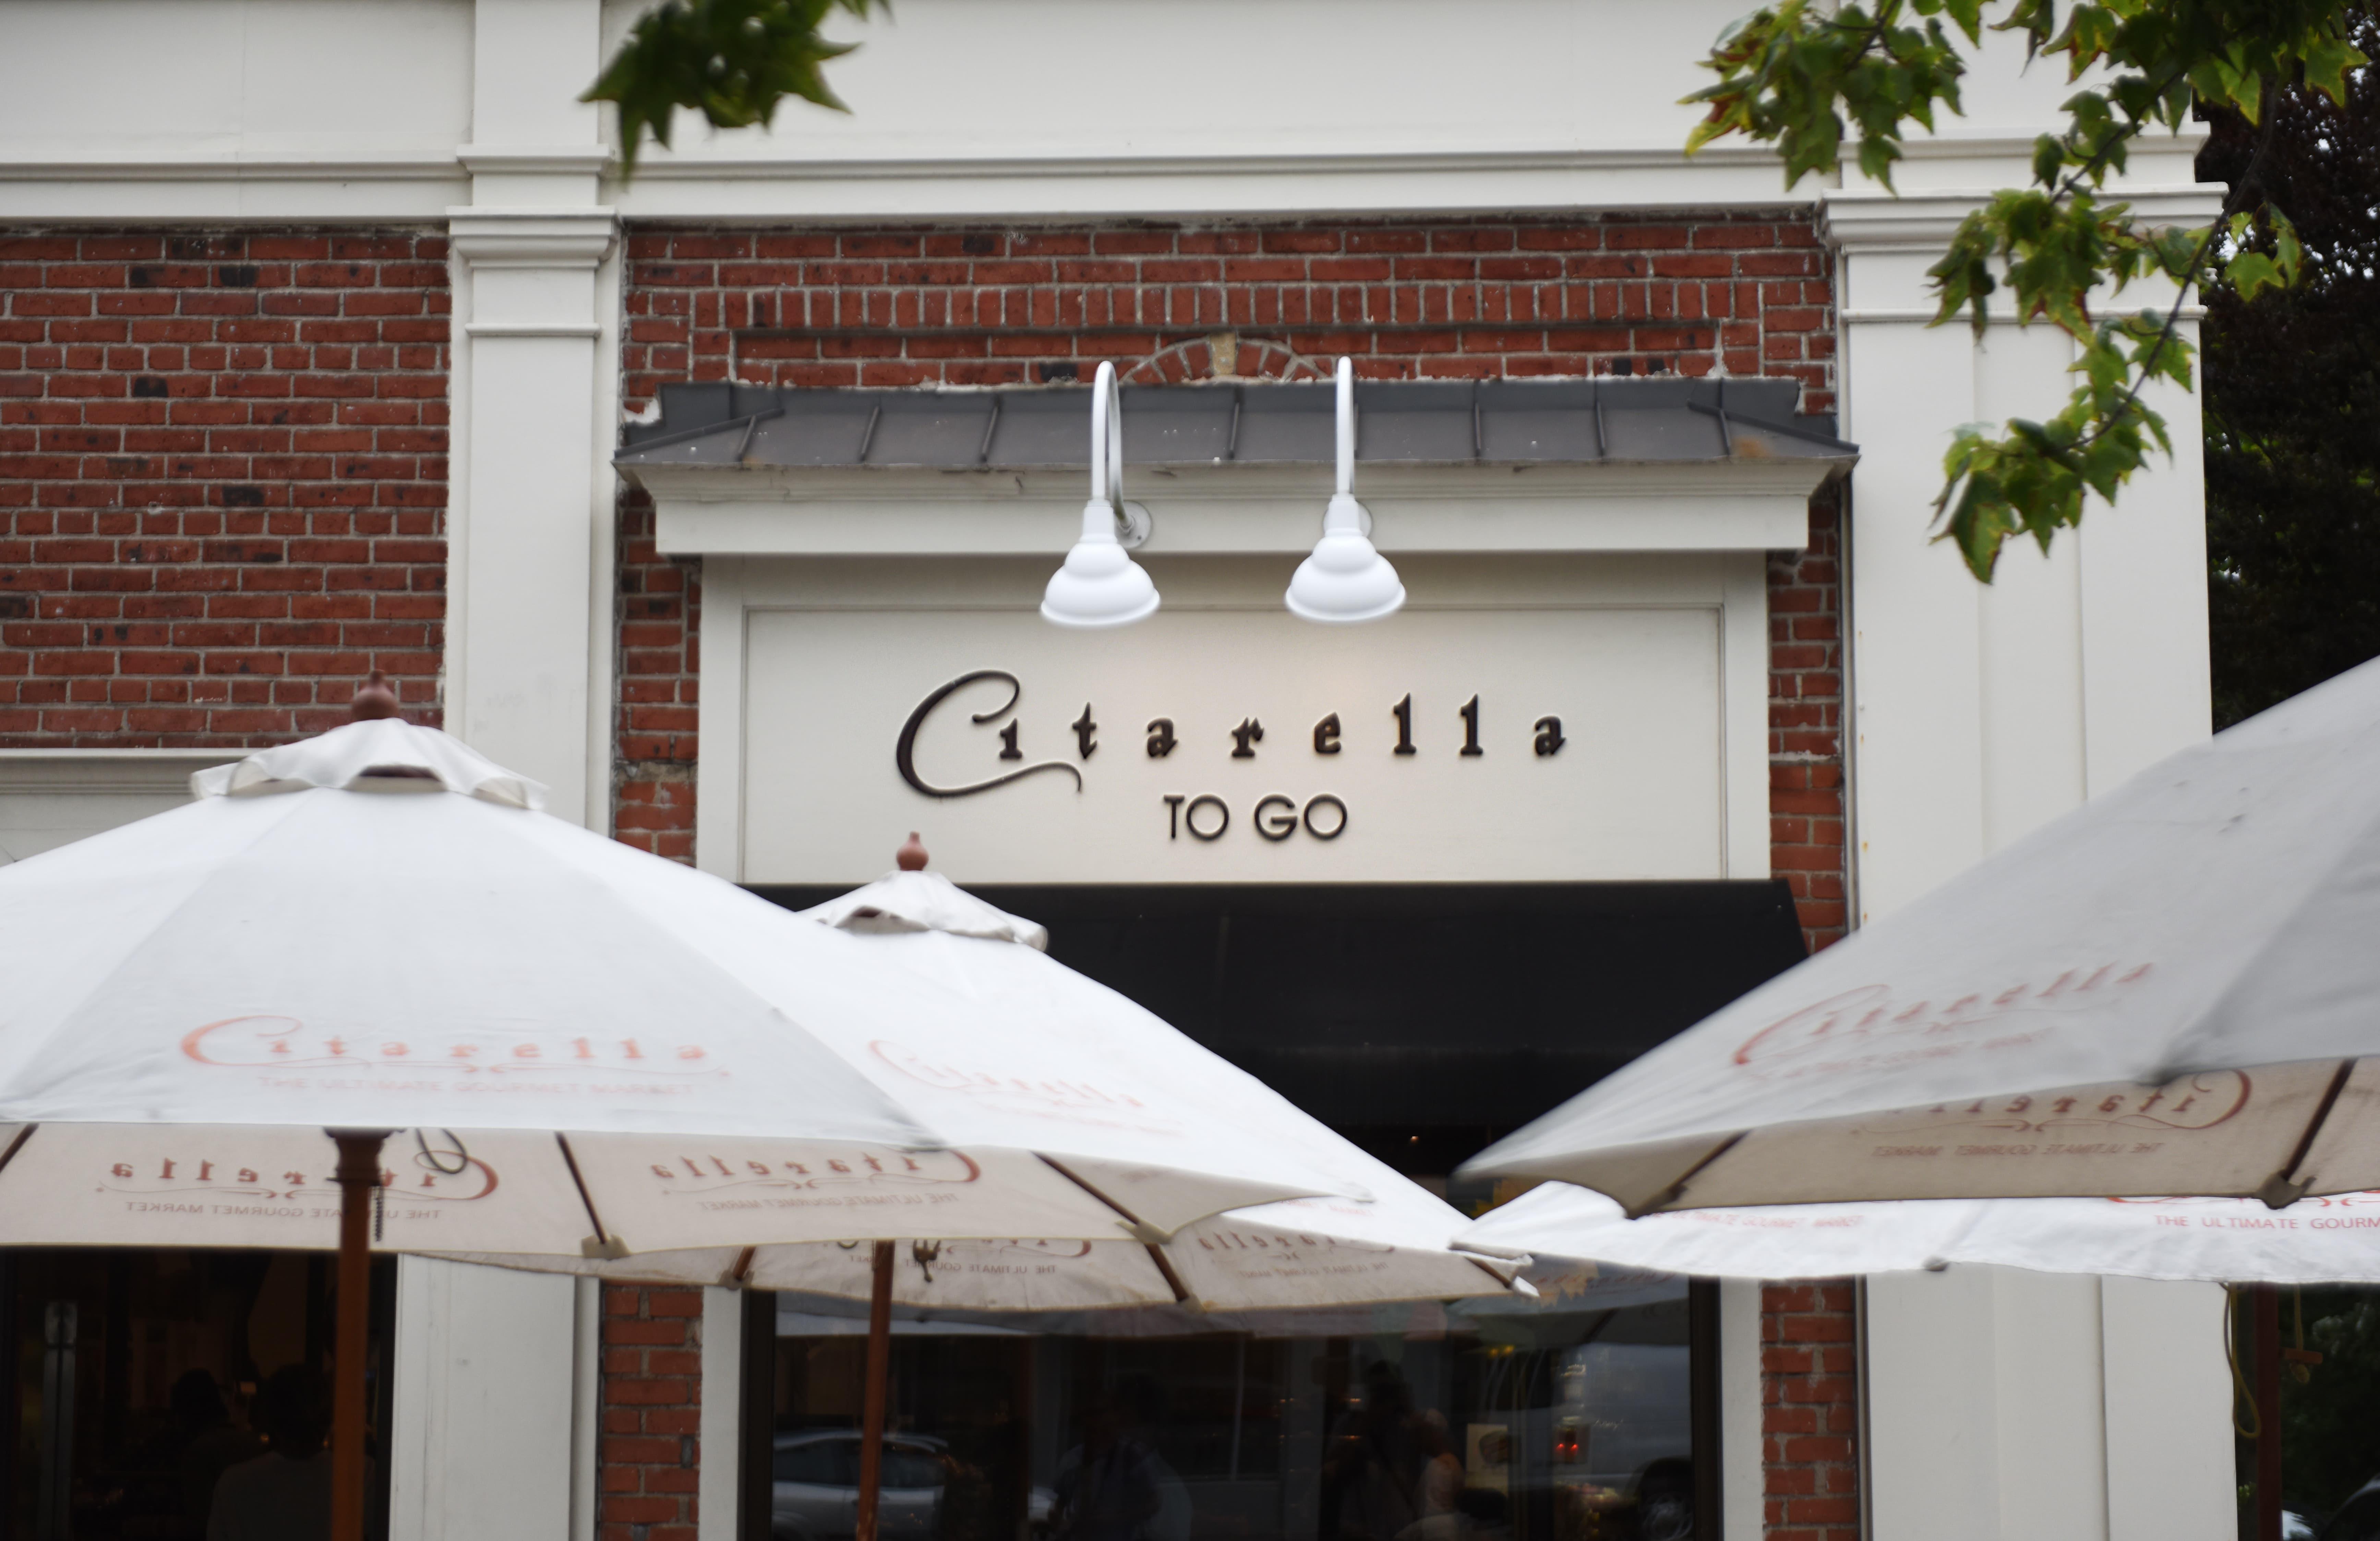 Citarella Gourmet Market - East Hampton image 3